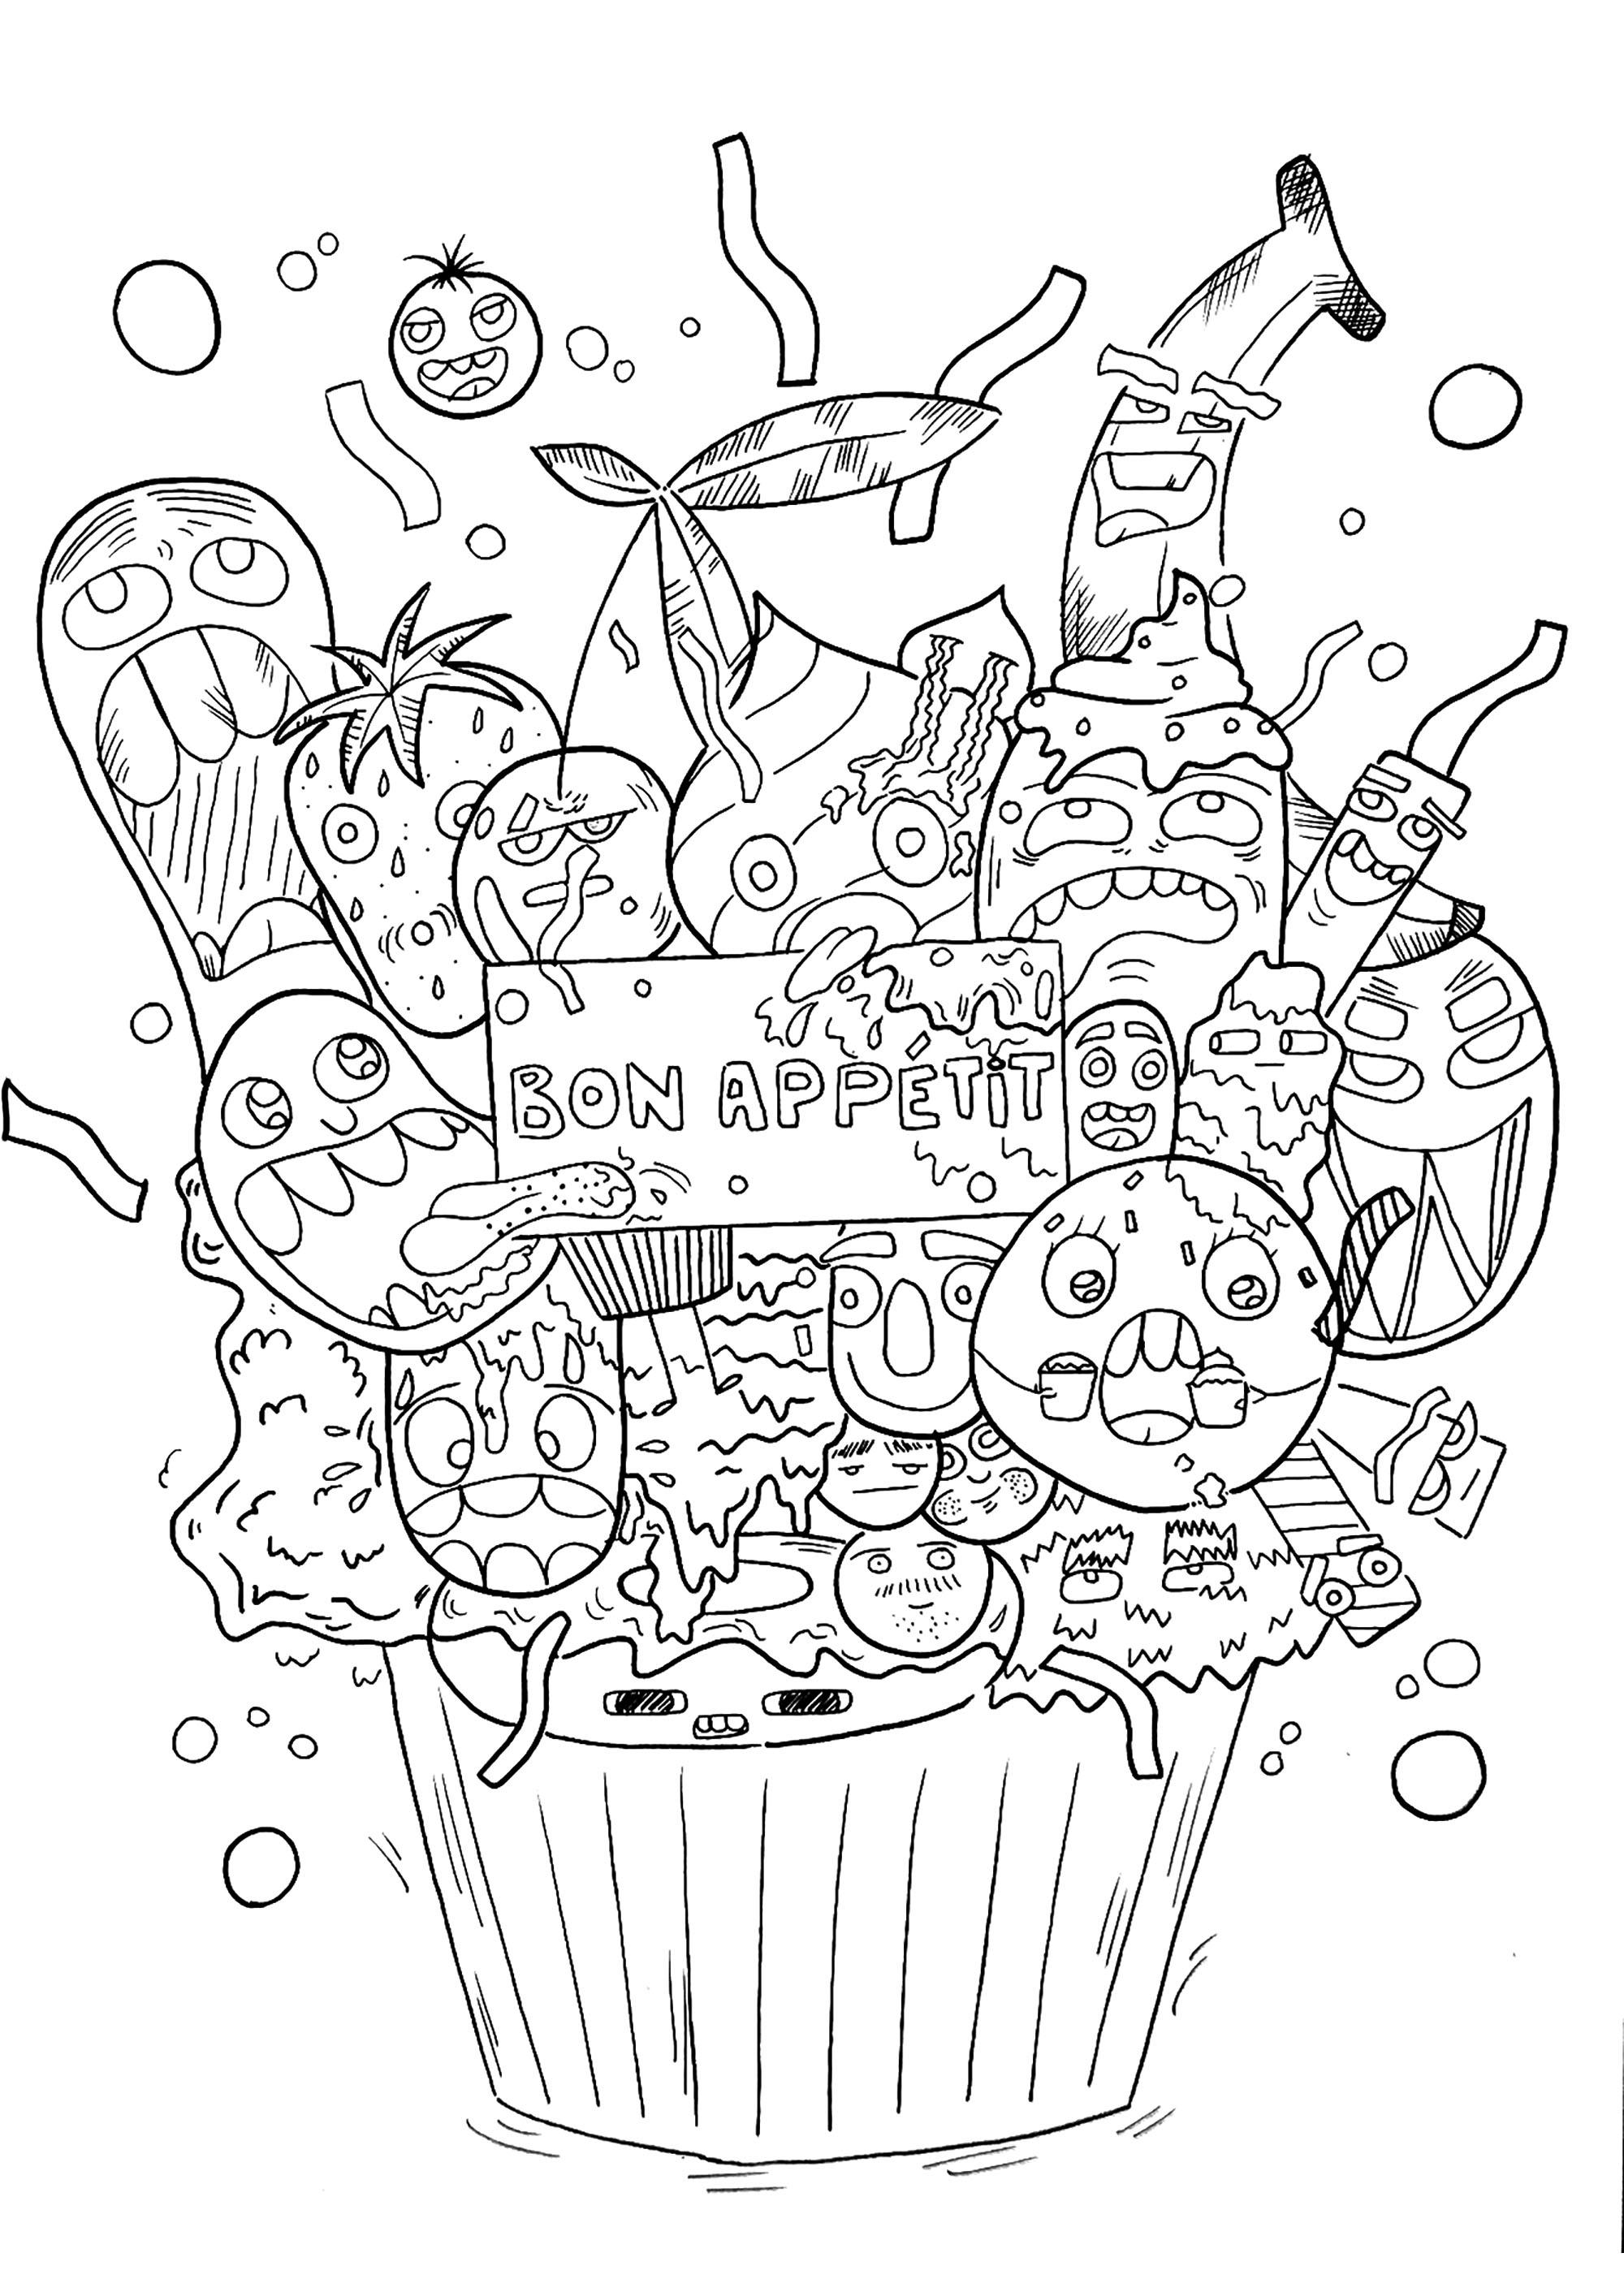 Disegni da Colorare per Adulti : Doodle art / Doodling - 1